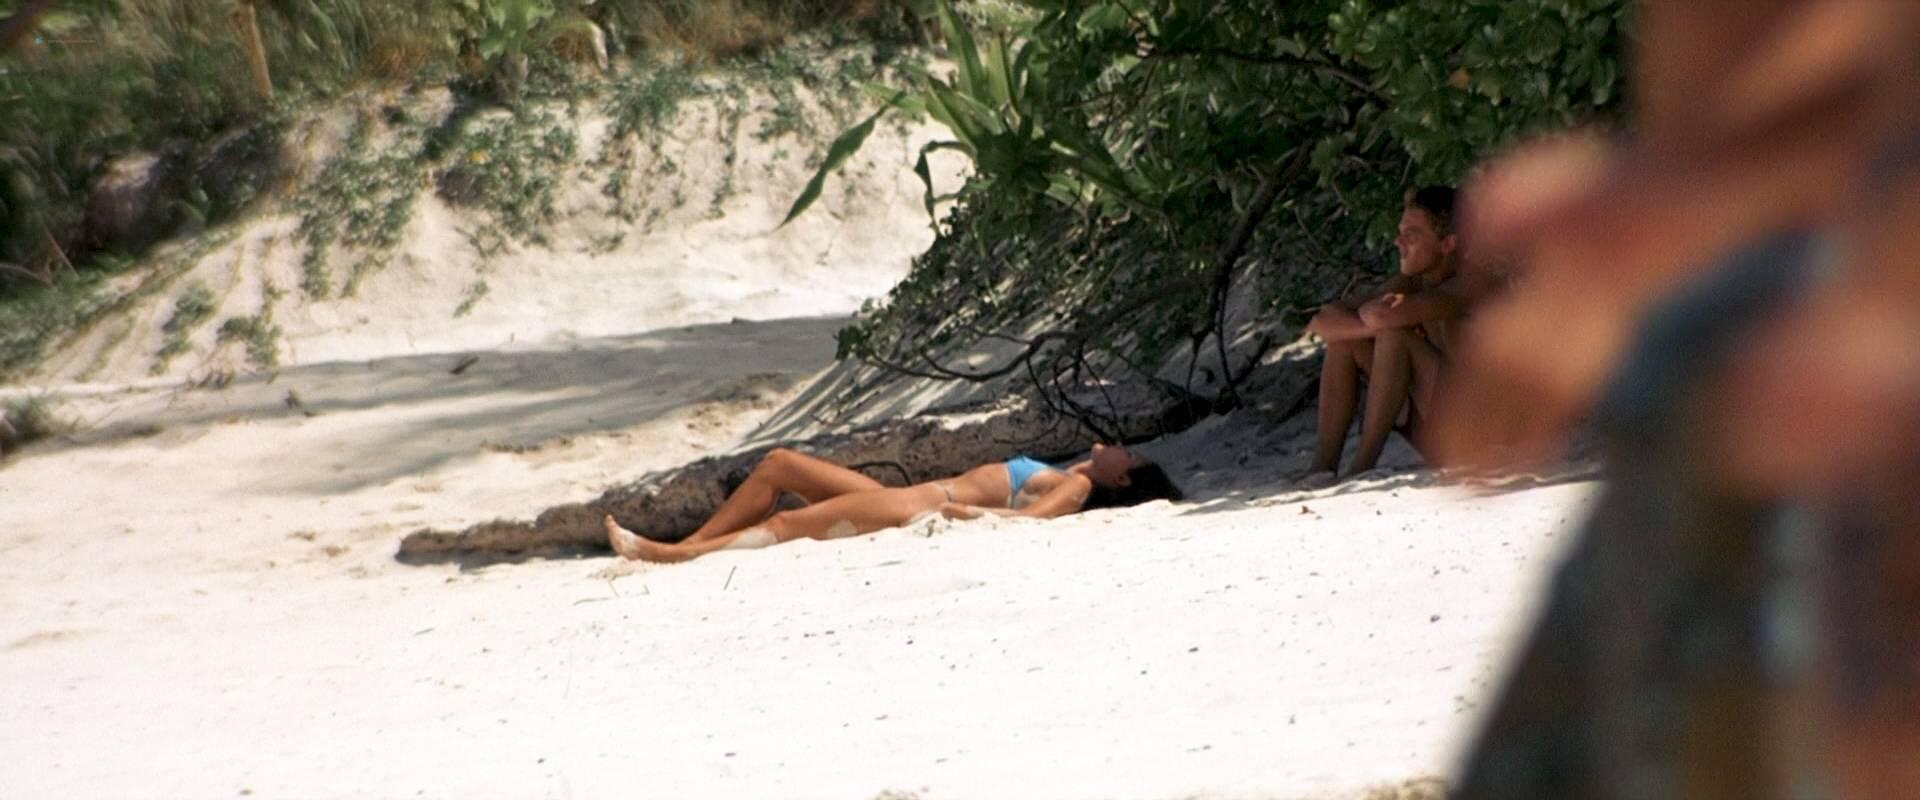 Virginie Ledoyen nude topless Tilda Swinton hot sex - The Beach (2000) HD 1080p BluRay (14)